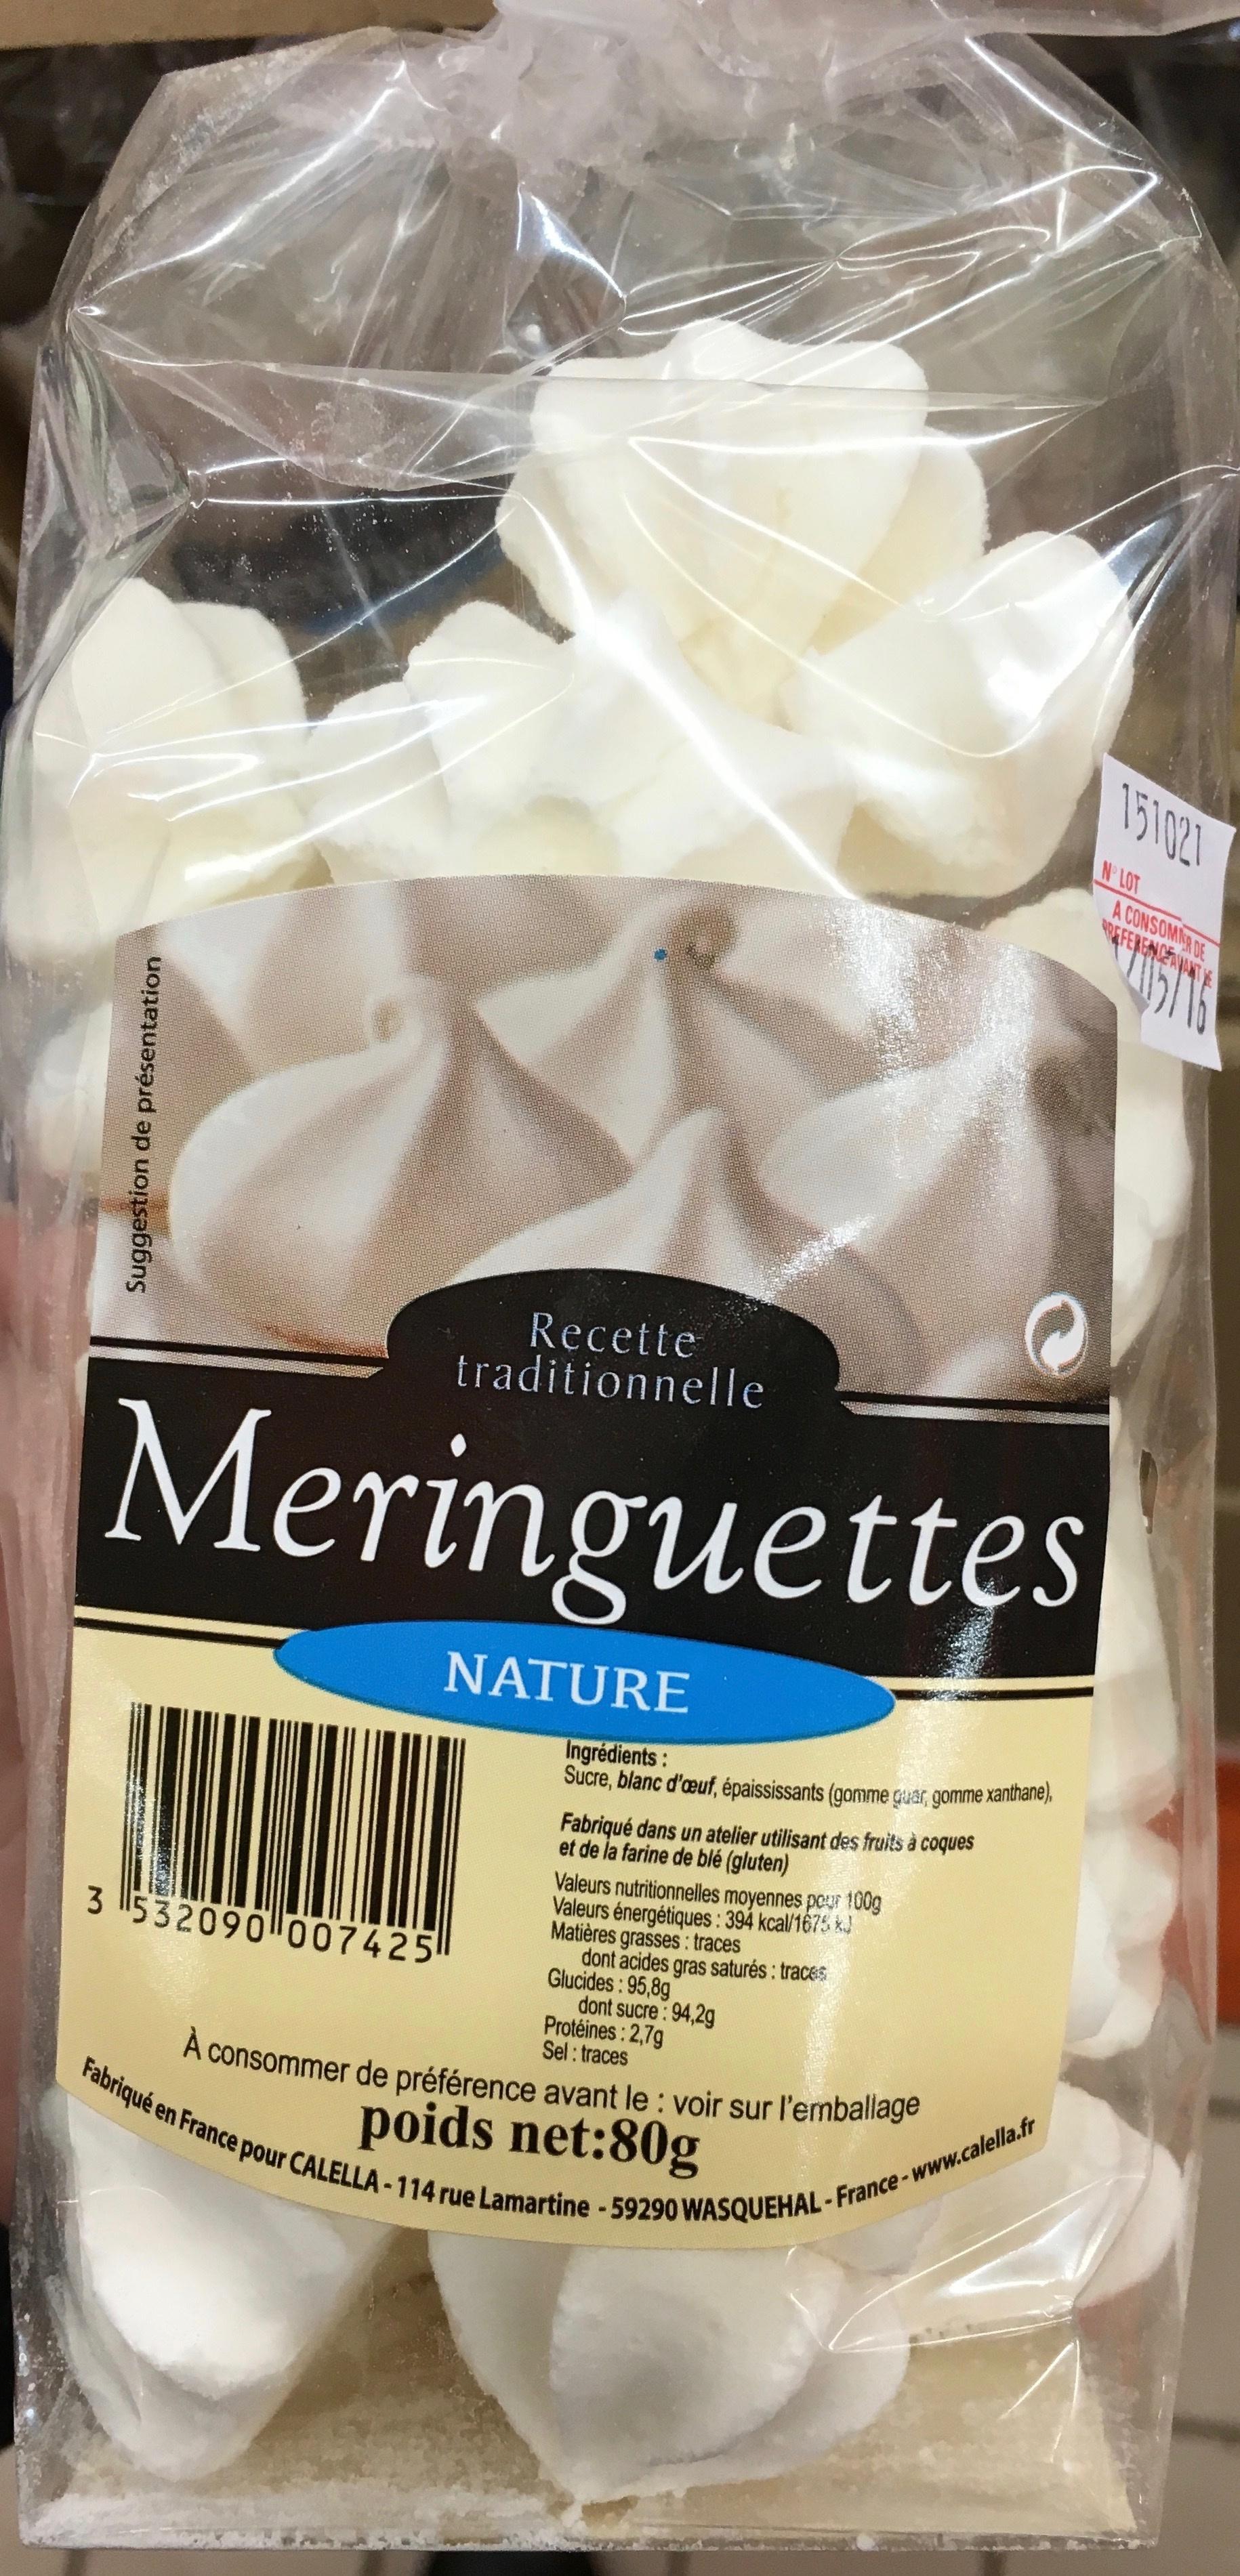 Meringuettes nature - Product - fr